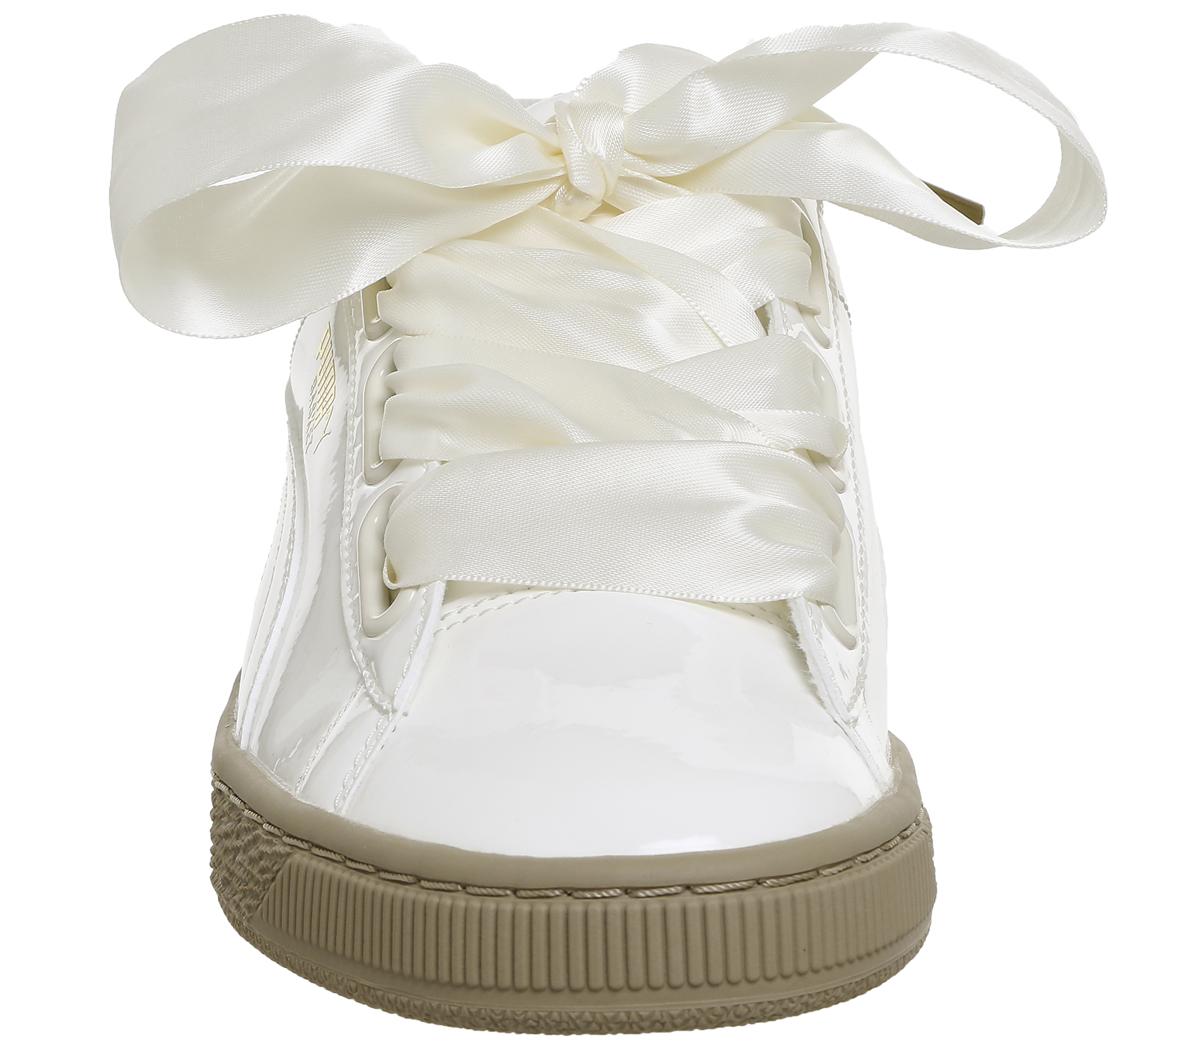 Wns De Brevets Coeur Panier Rose Sneakers Puma yTsSlEc5DO